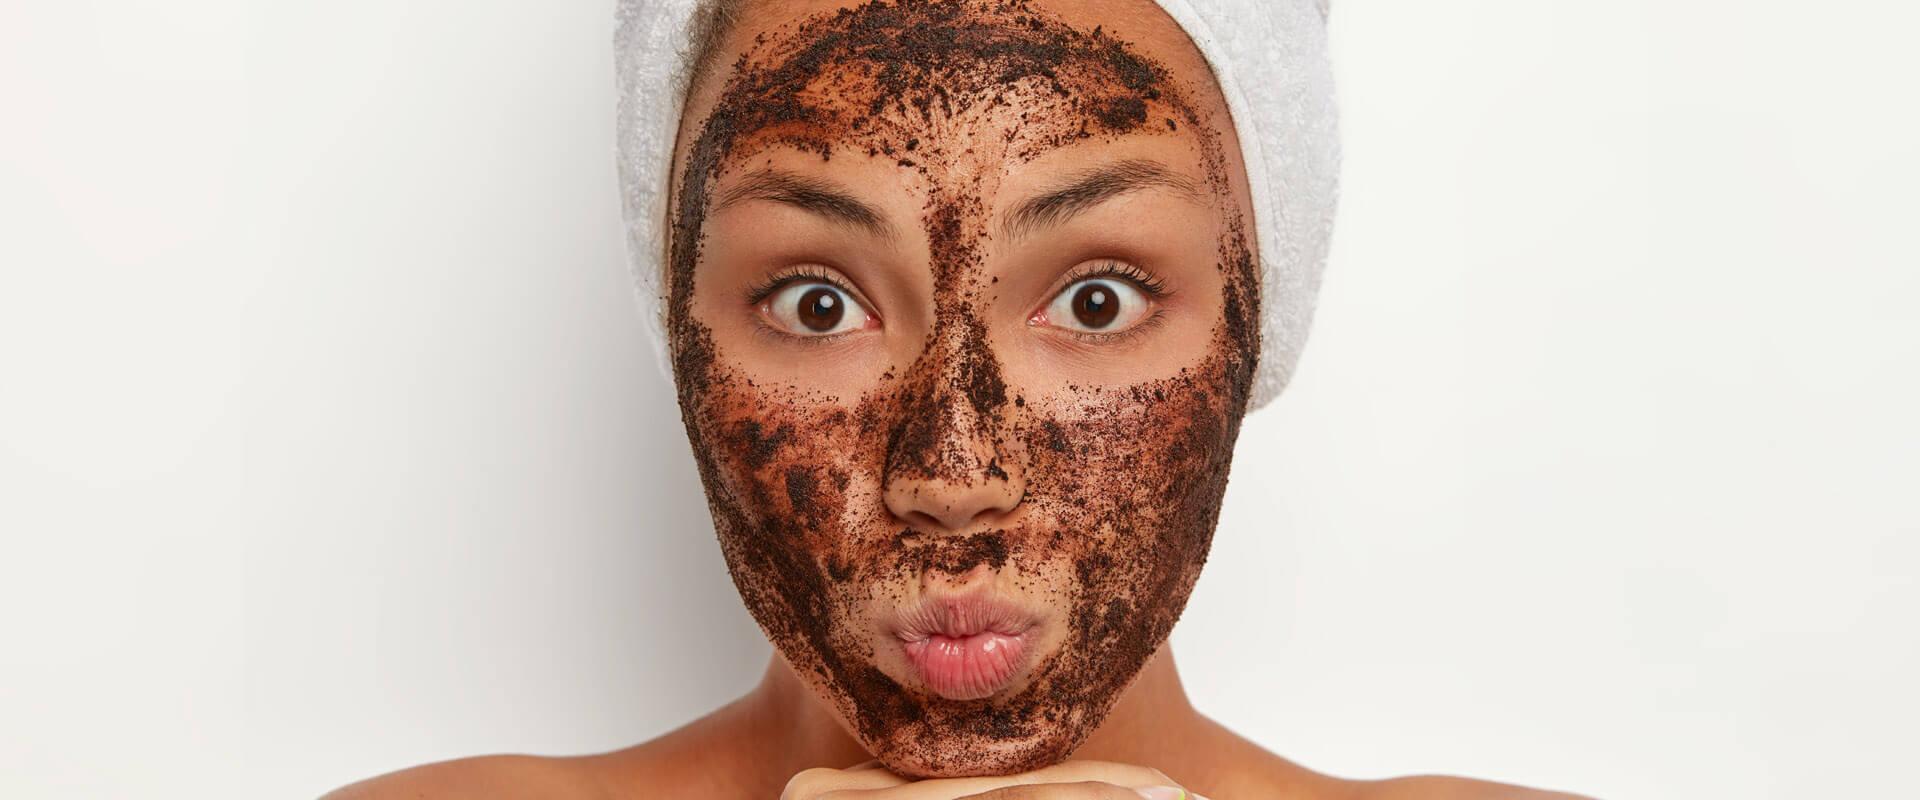 usar café sobre la piel como exfoliante